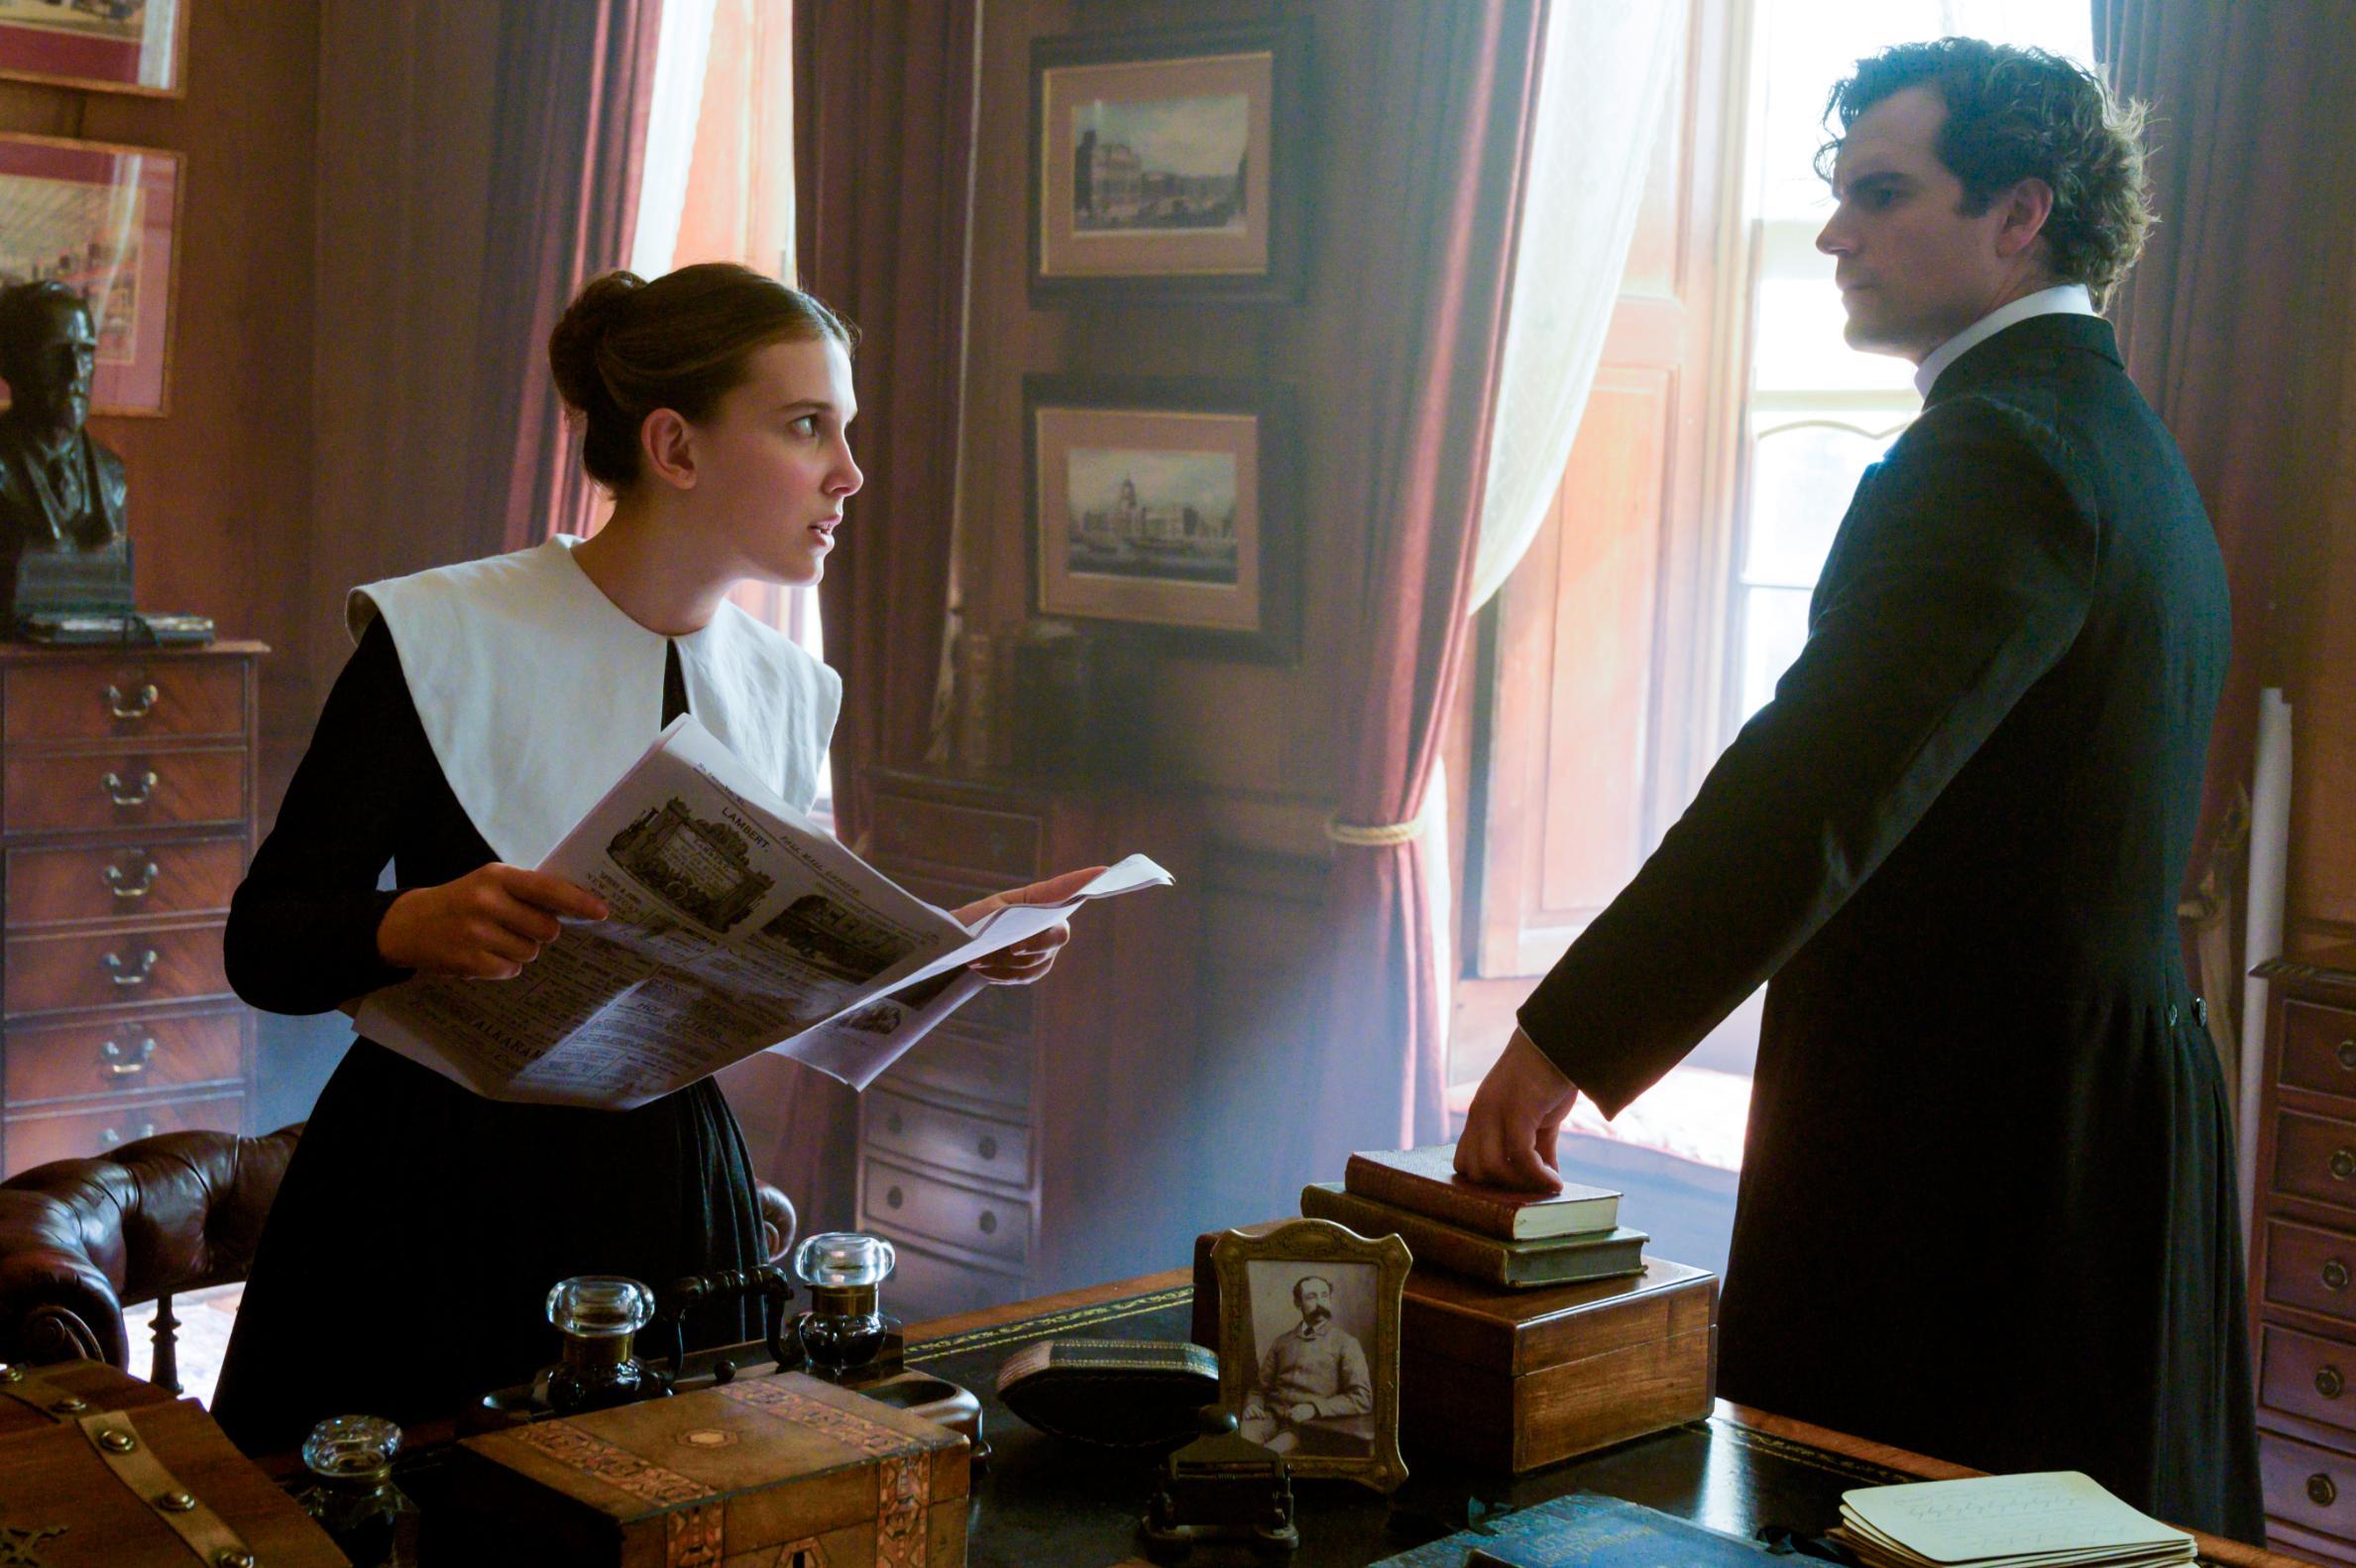 'Enola Holmes' showcases Millie Bobby Brown as Sherlock's brilliant sister